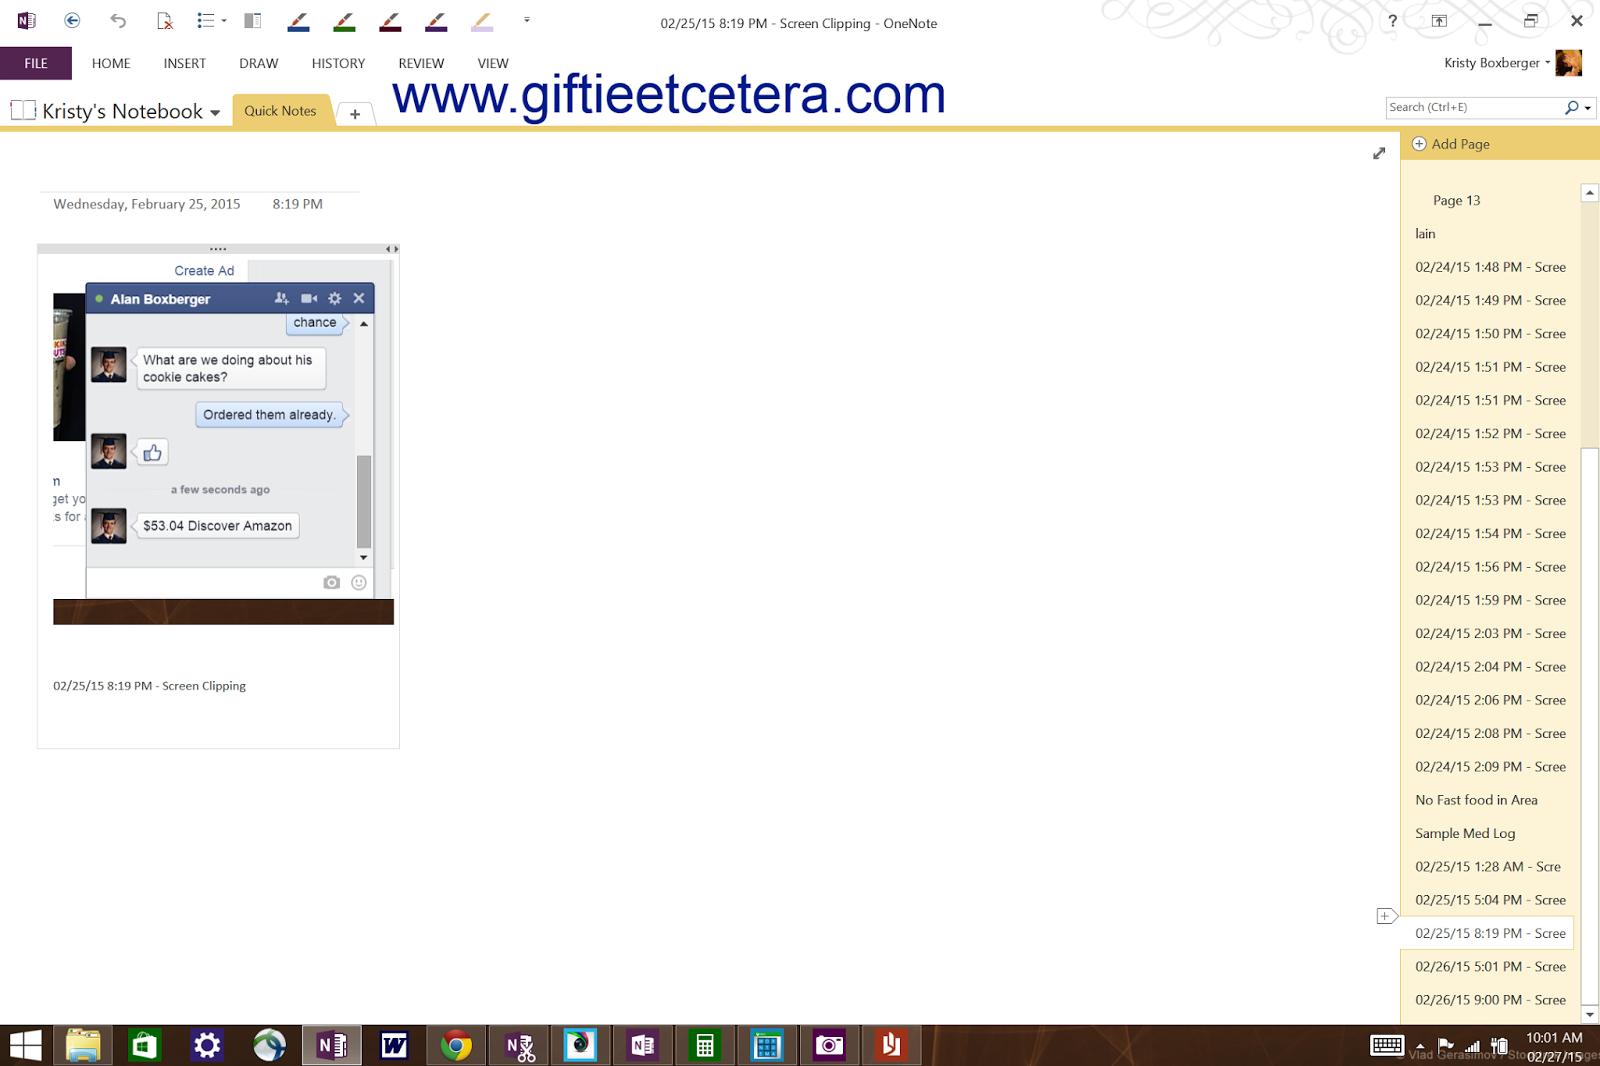 surface pro 3, one note, screenshots, organize, medical logs, google maps